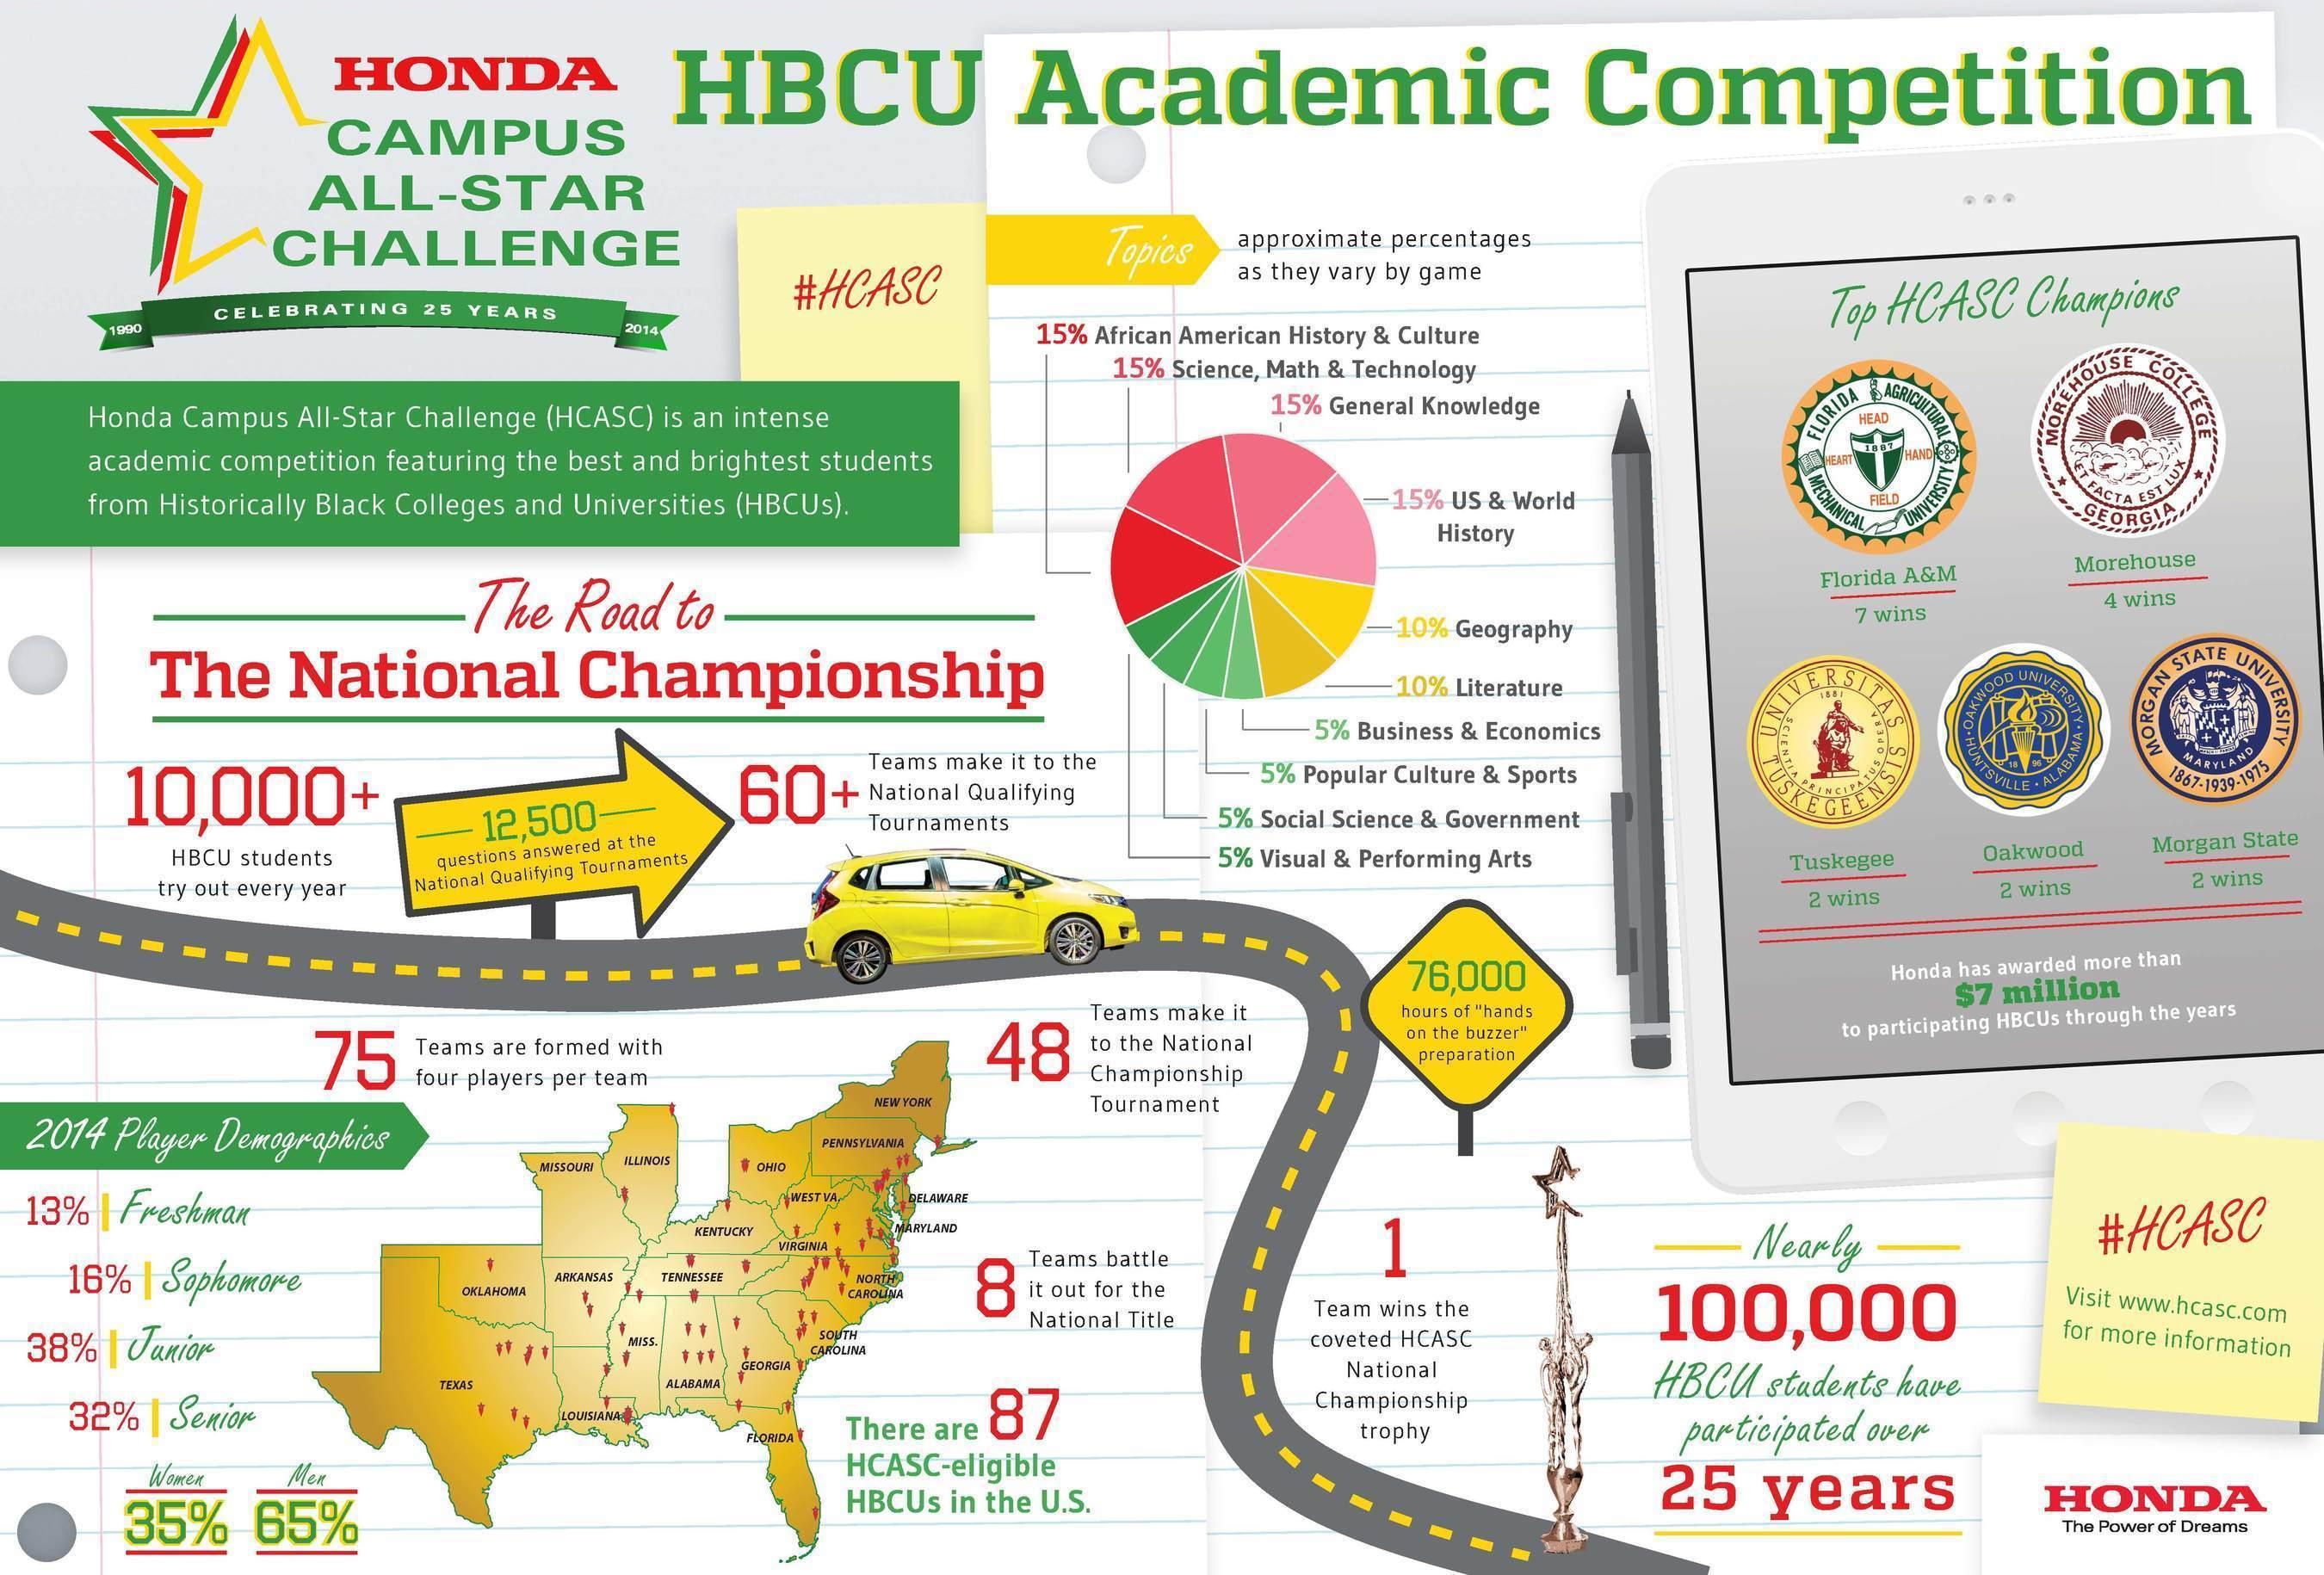 25th Anniversary Honda Campus All-Star Challenge (PRNewsFoto/American Honda Motor Co., Inc.)